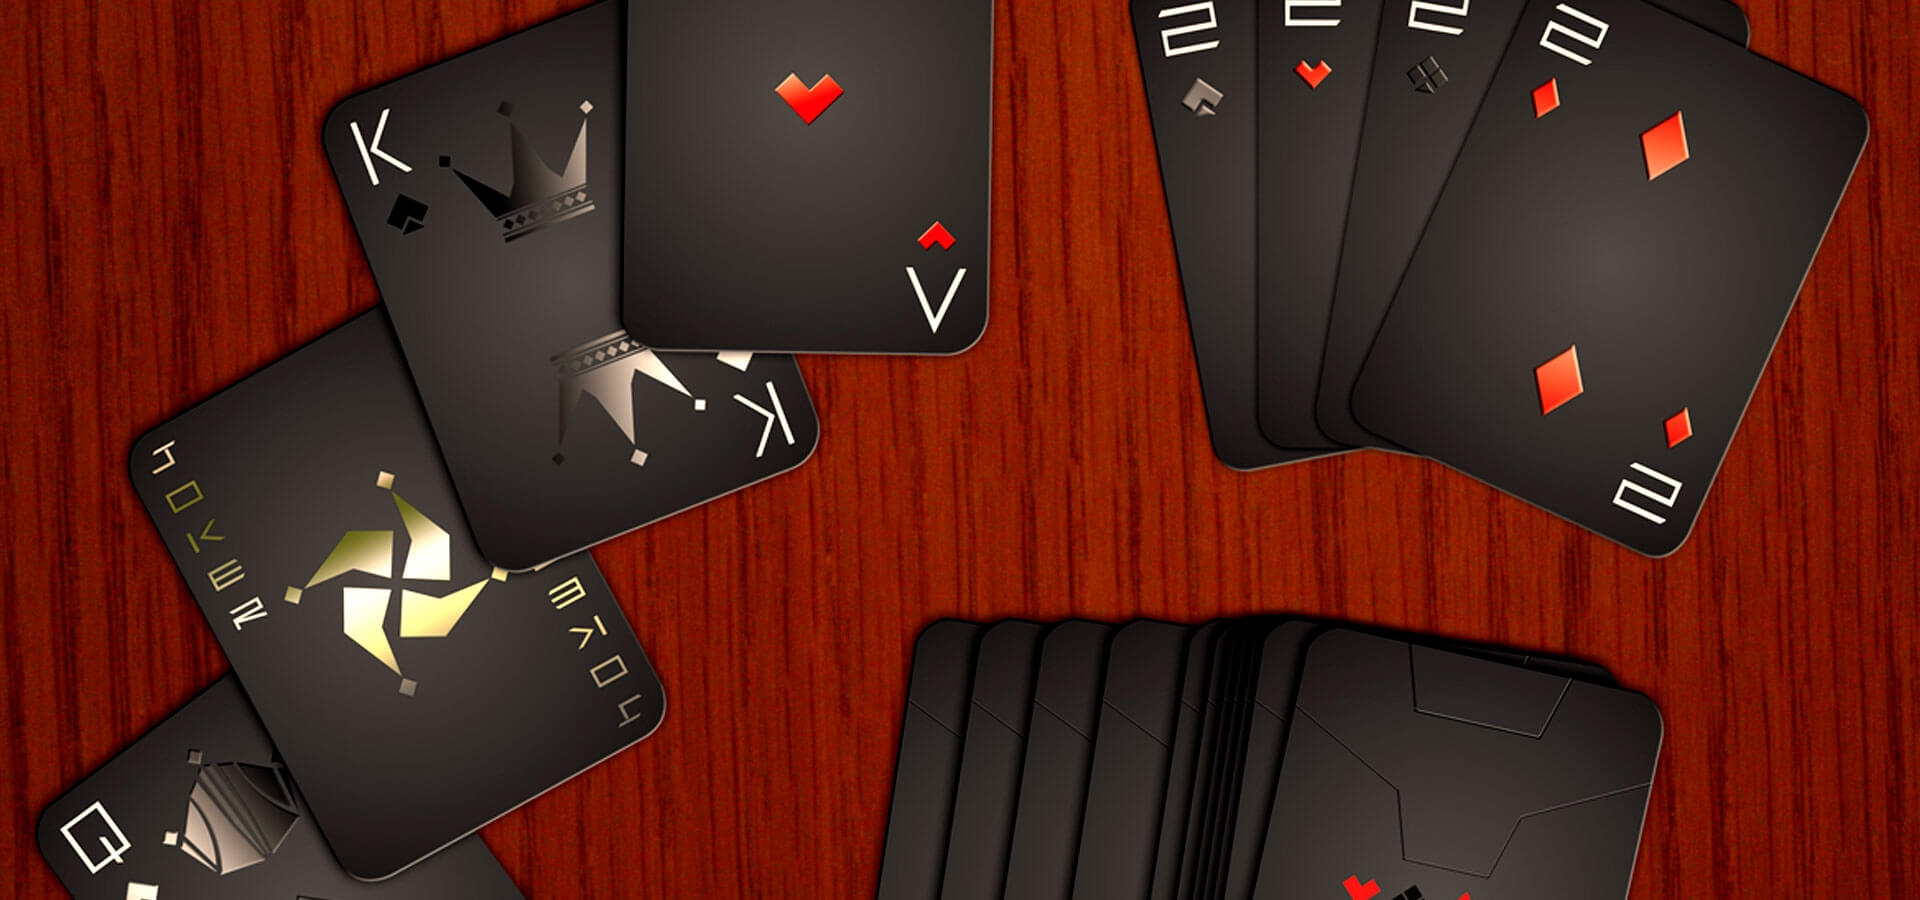 22+ Playing Card Designs | Free & Premium Templates Inside Playing Card Design Template